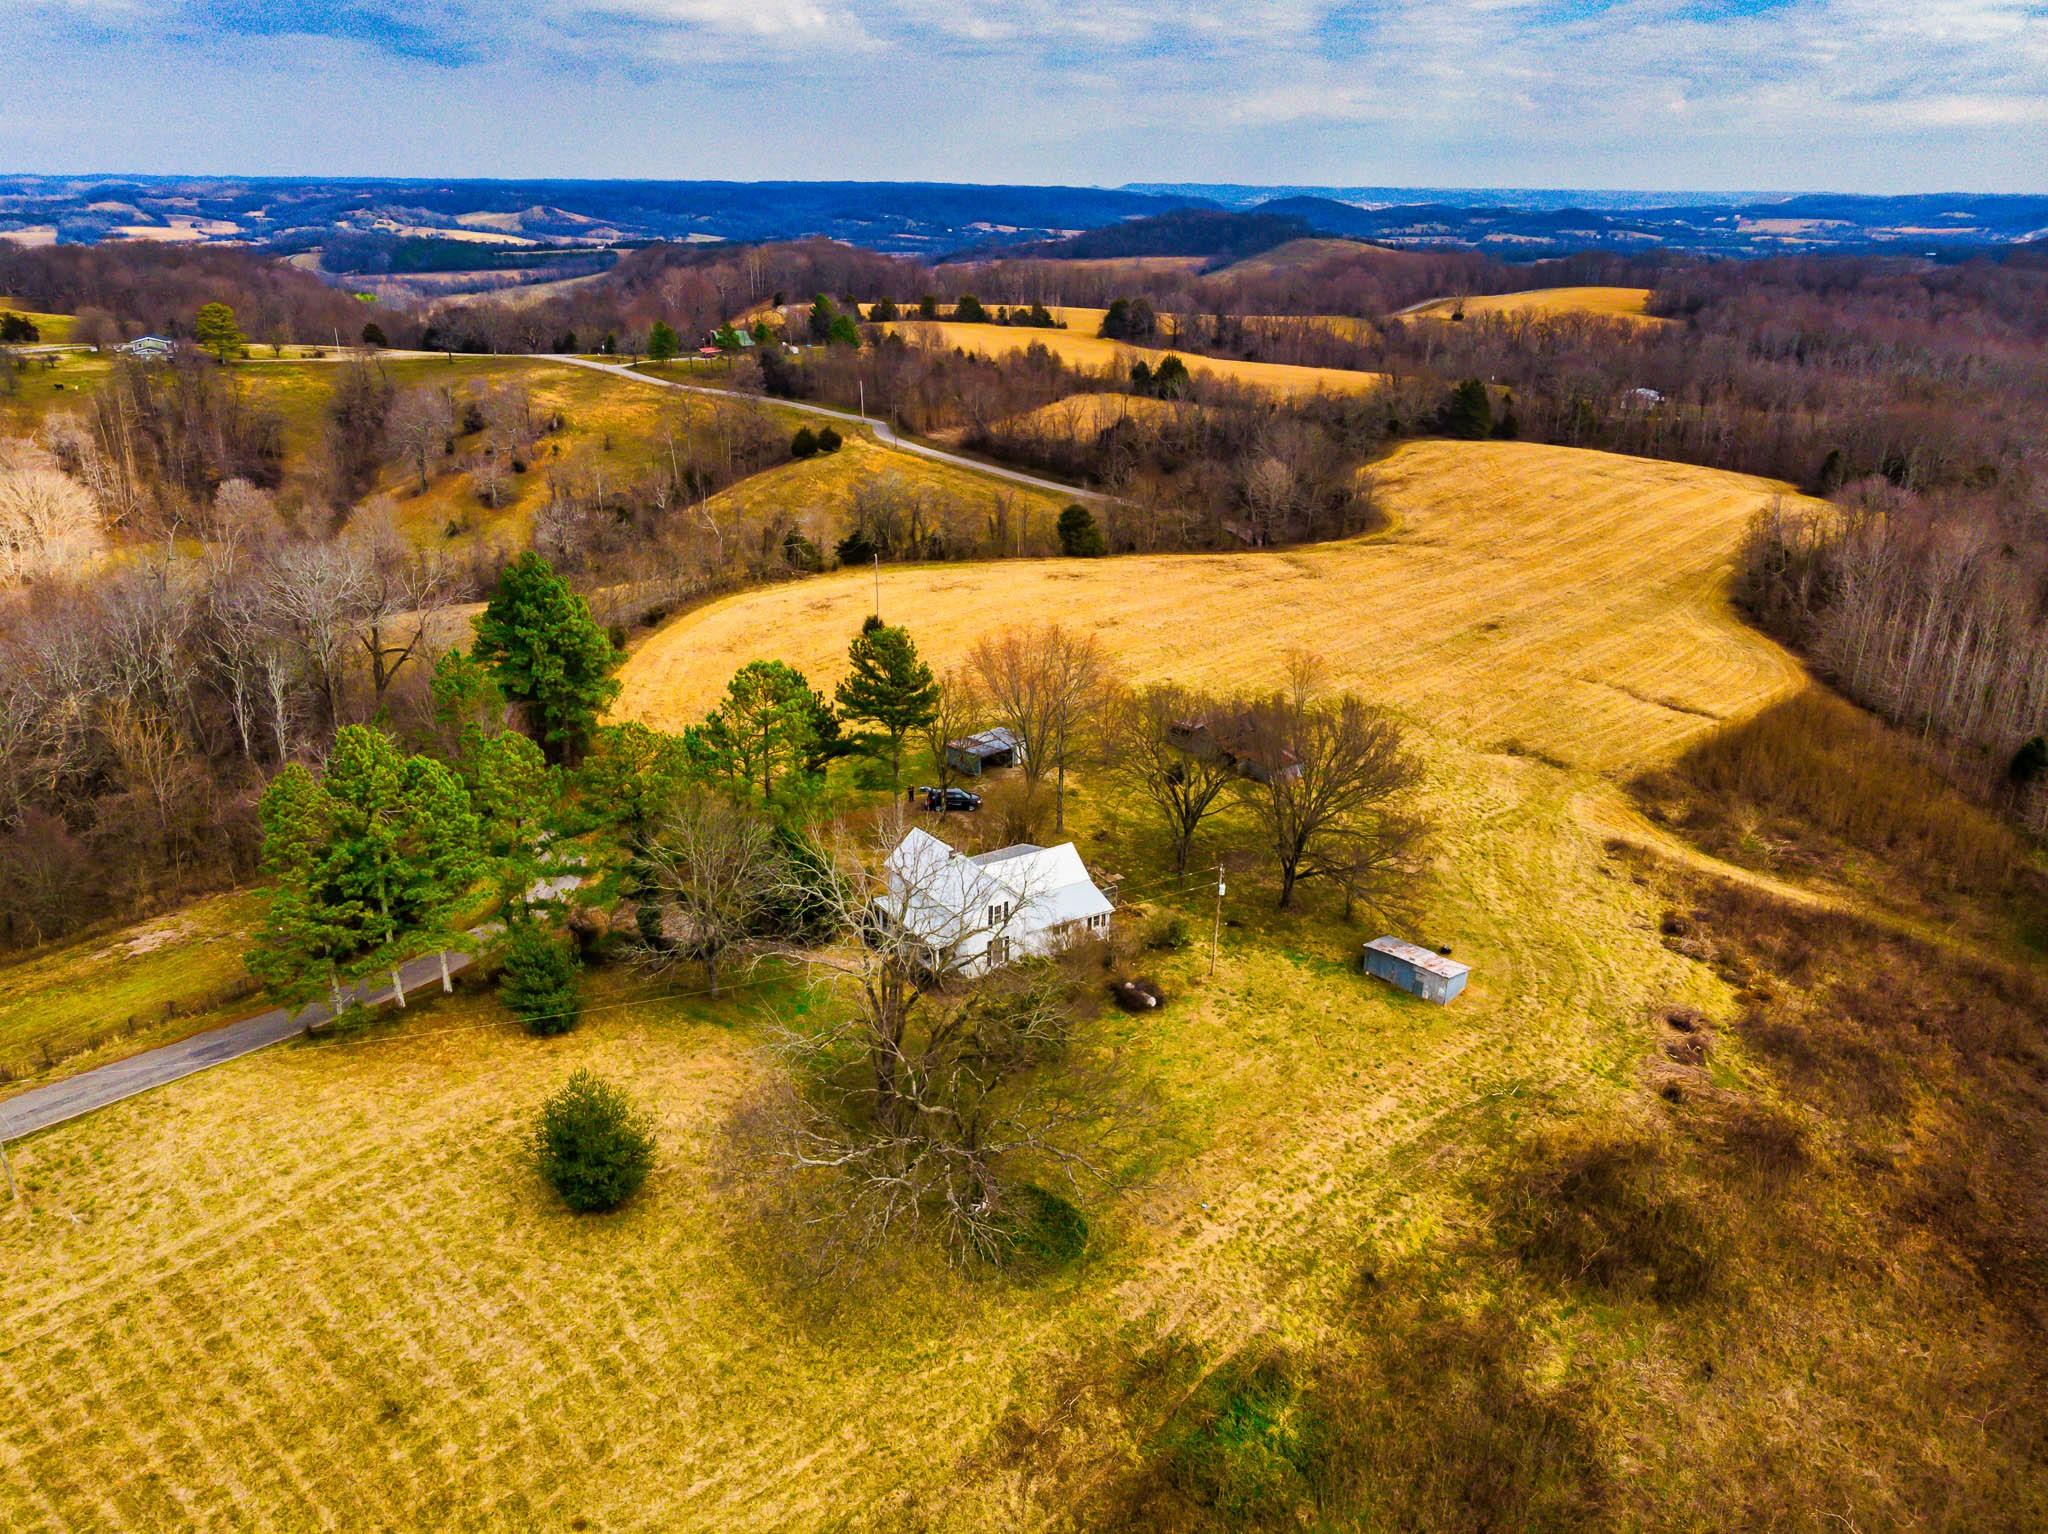 412 Carroll Ridge Rd, Pulaski, Tennessee 38478, 3 Bedrooms Bedrooms, ,2 BathroomsBathrooms,Single Family,For Sale,412 Carroll Ridge Rd,2,2226116